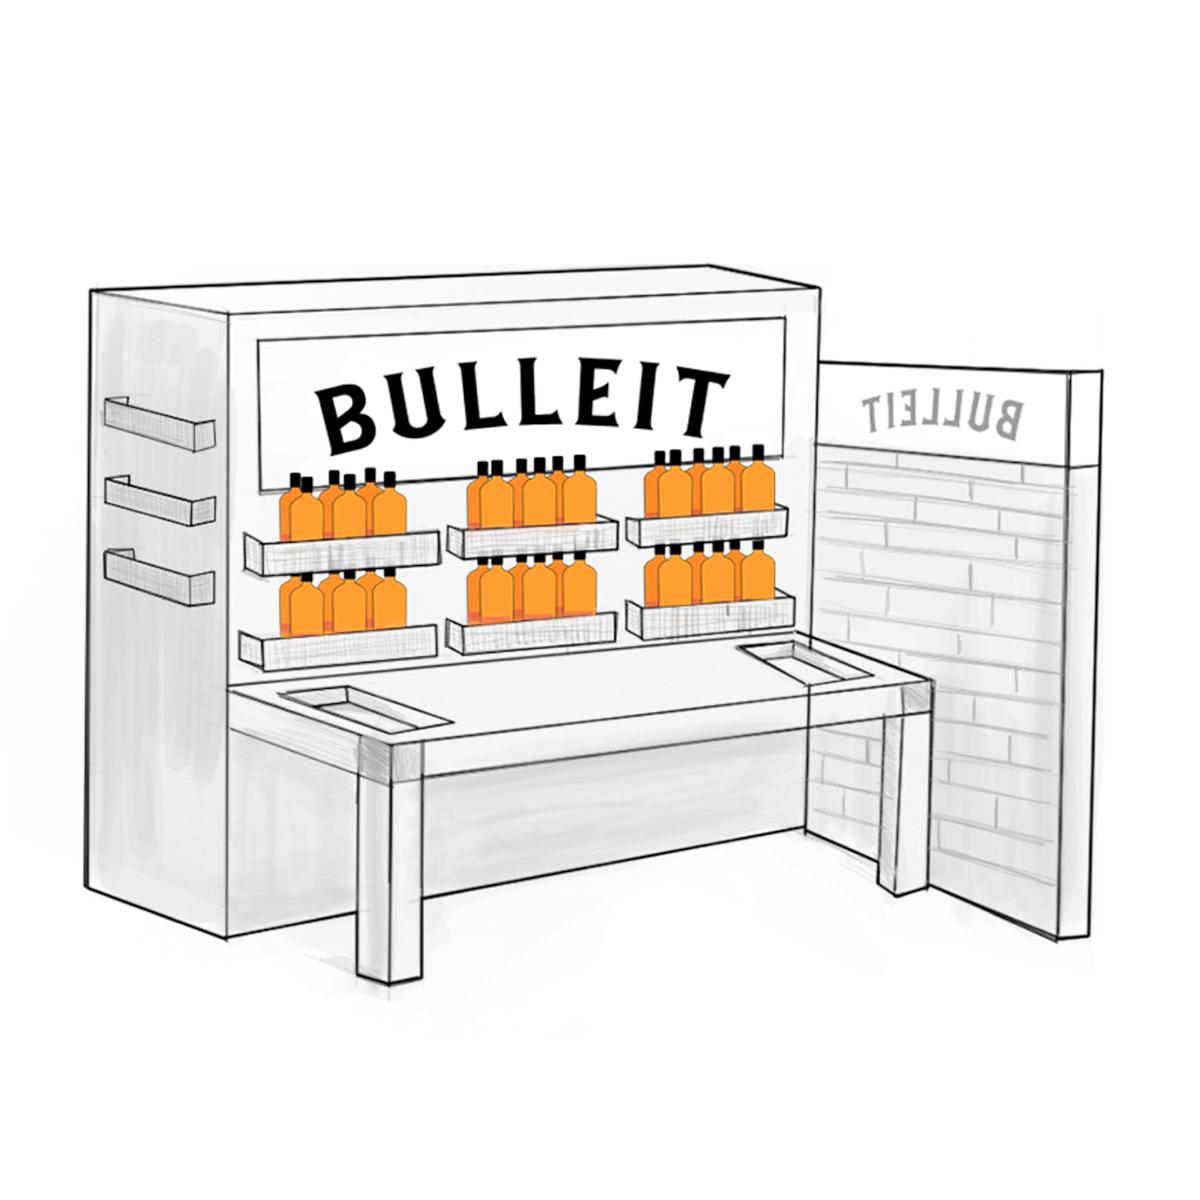 Bulleitdisplays4.jpg